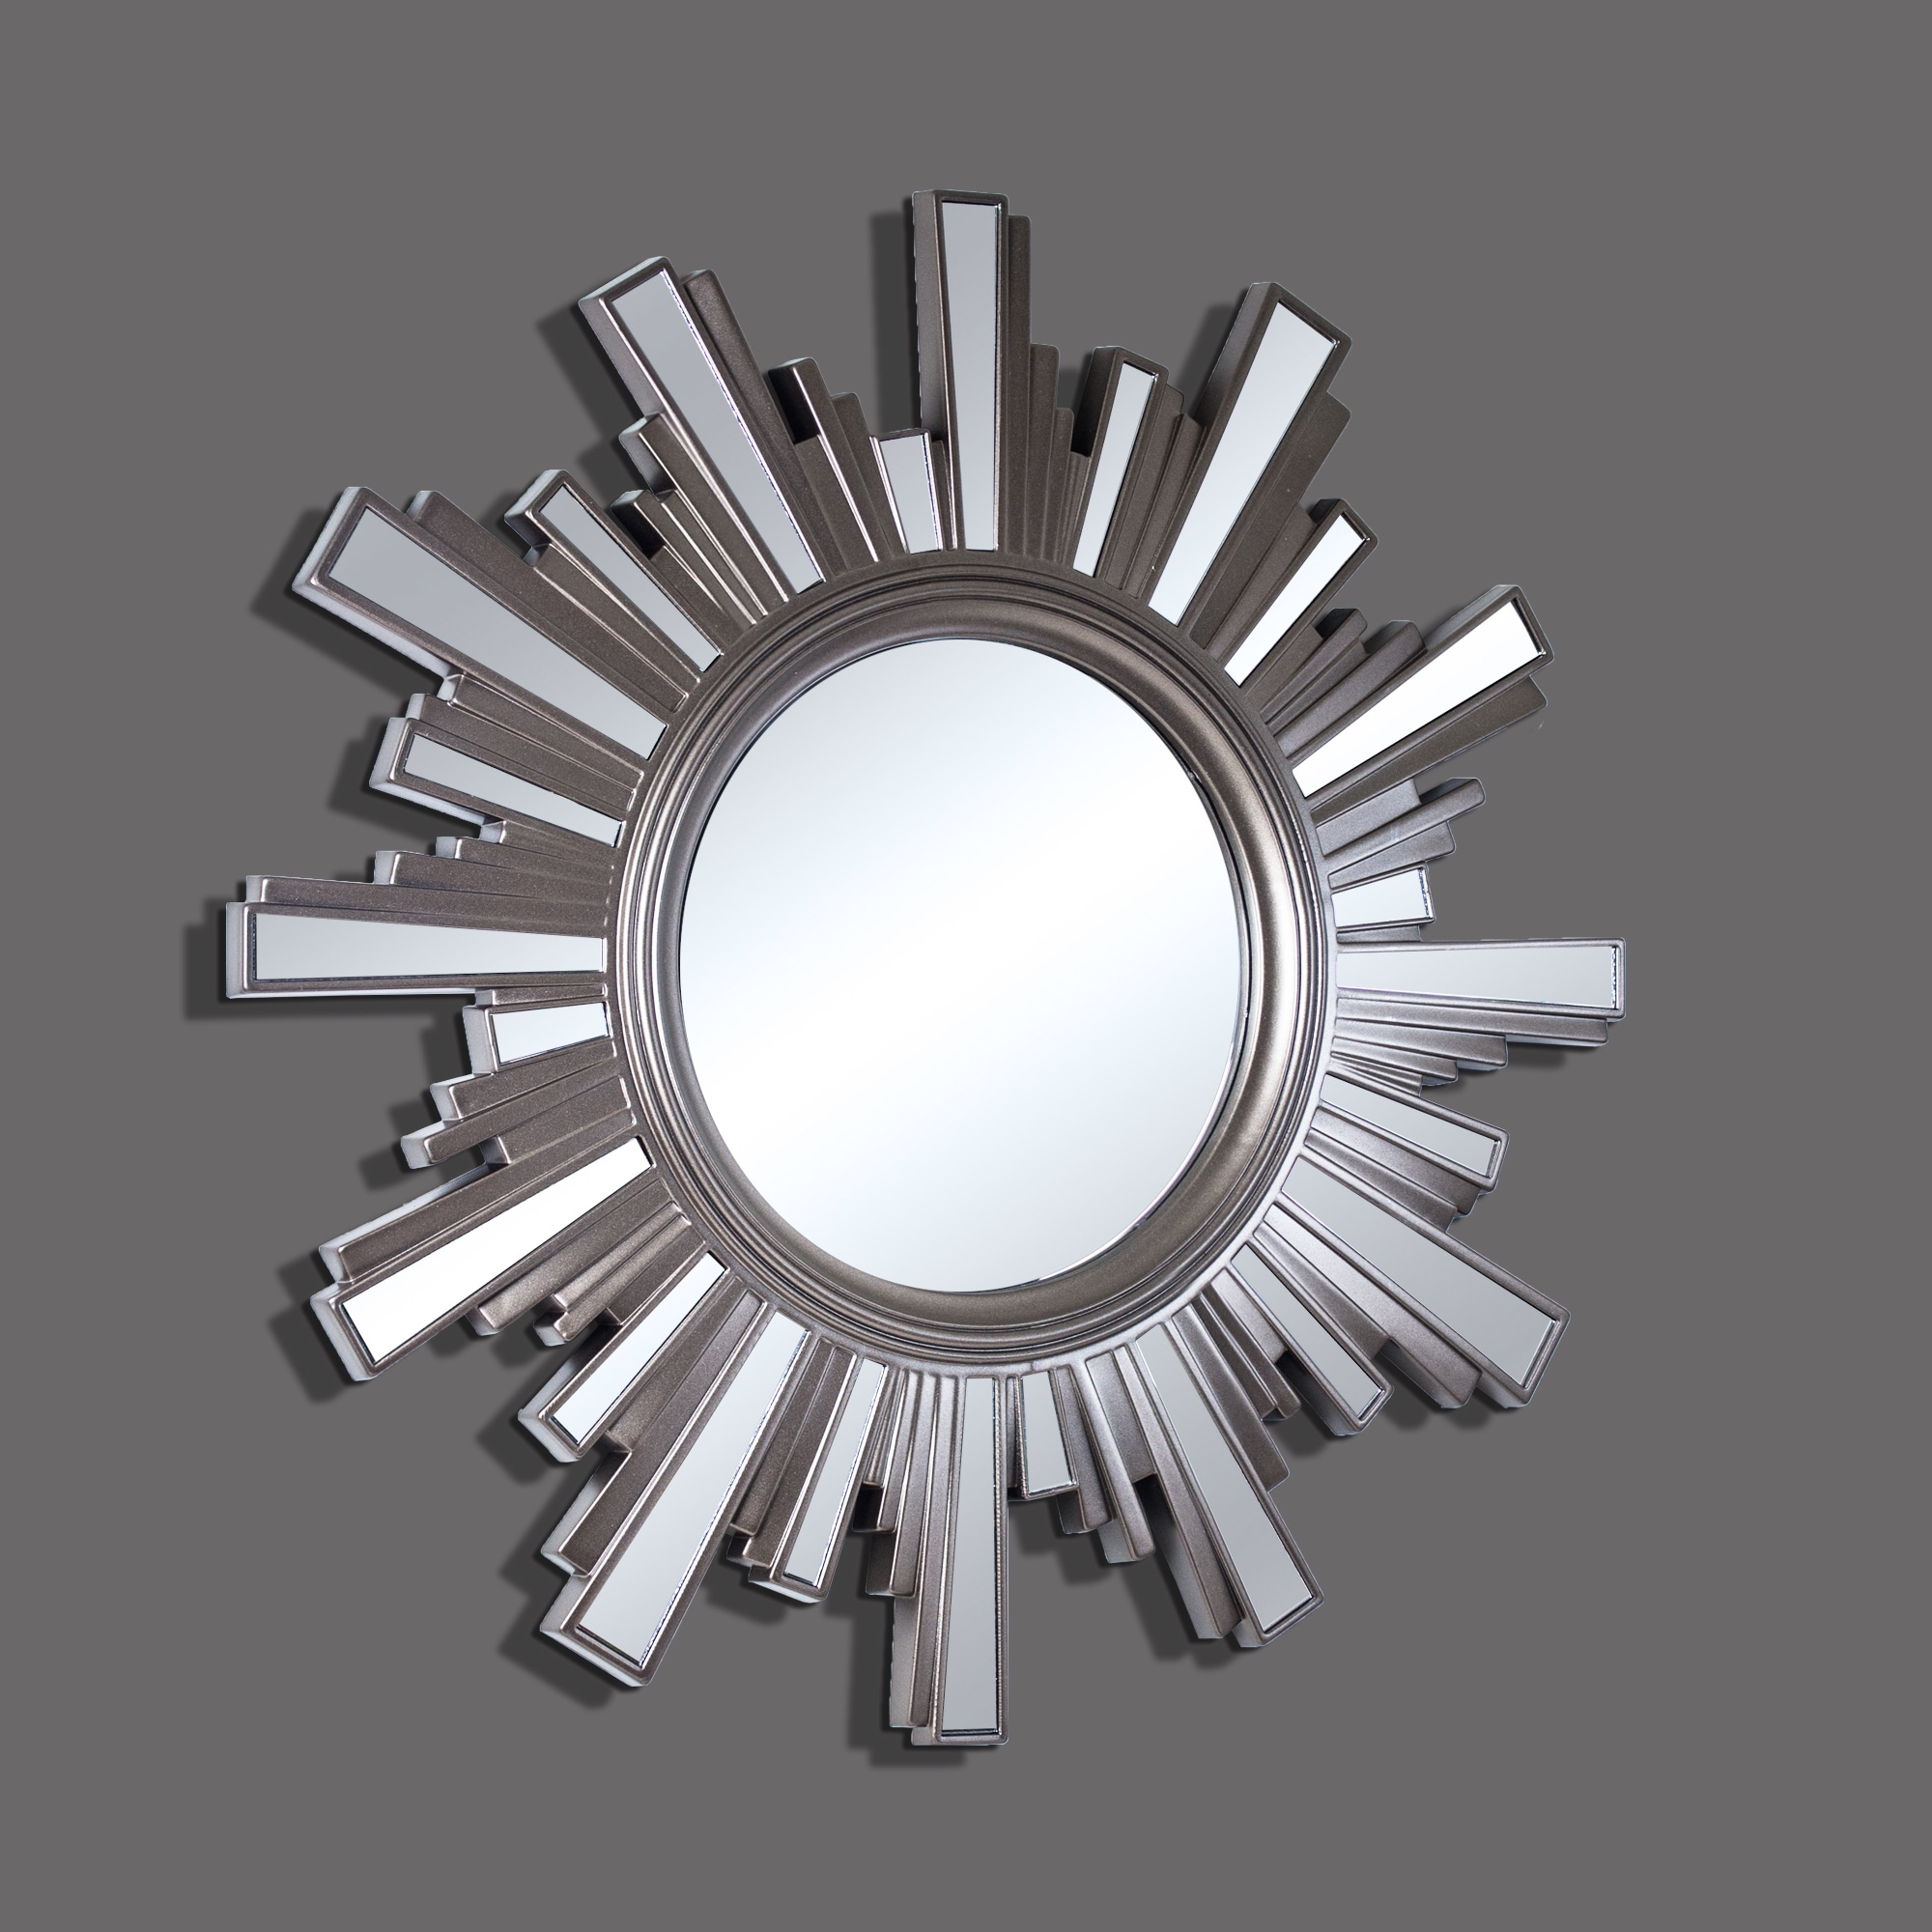 Skyline Pewter Sunburst Decorative Framed Wall Mirrors (Set of 5 ...